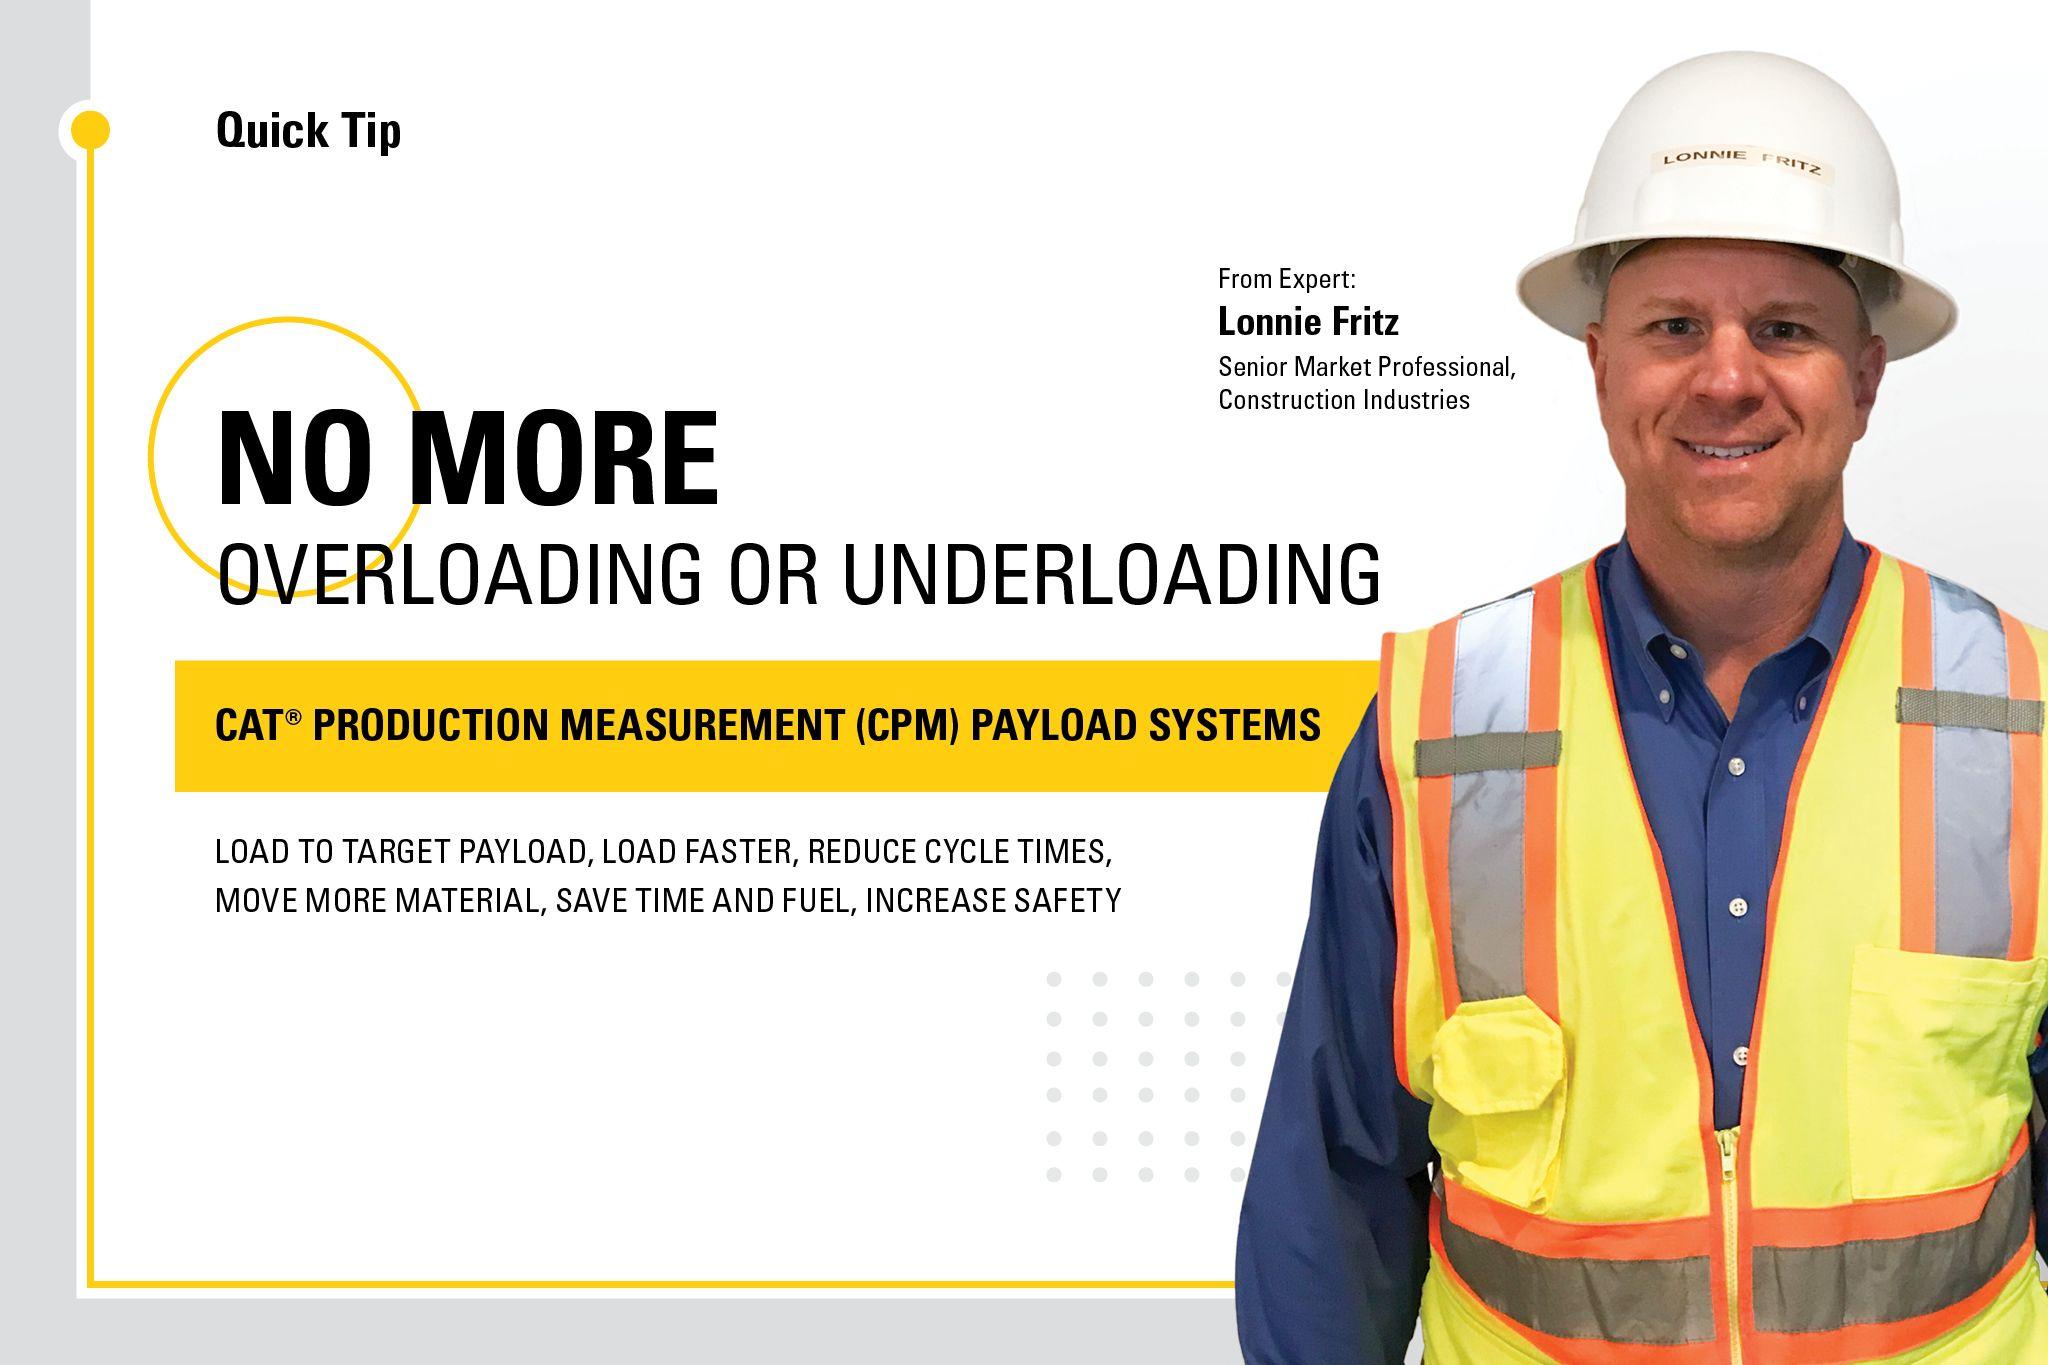 No more overloading or underloading.